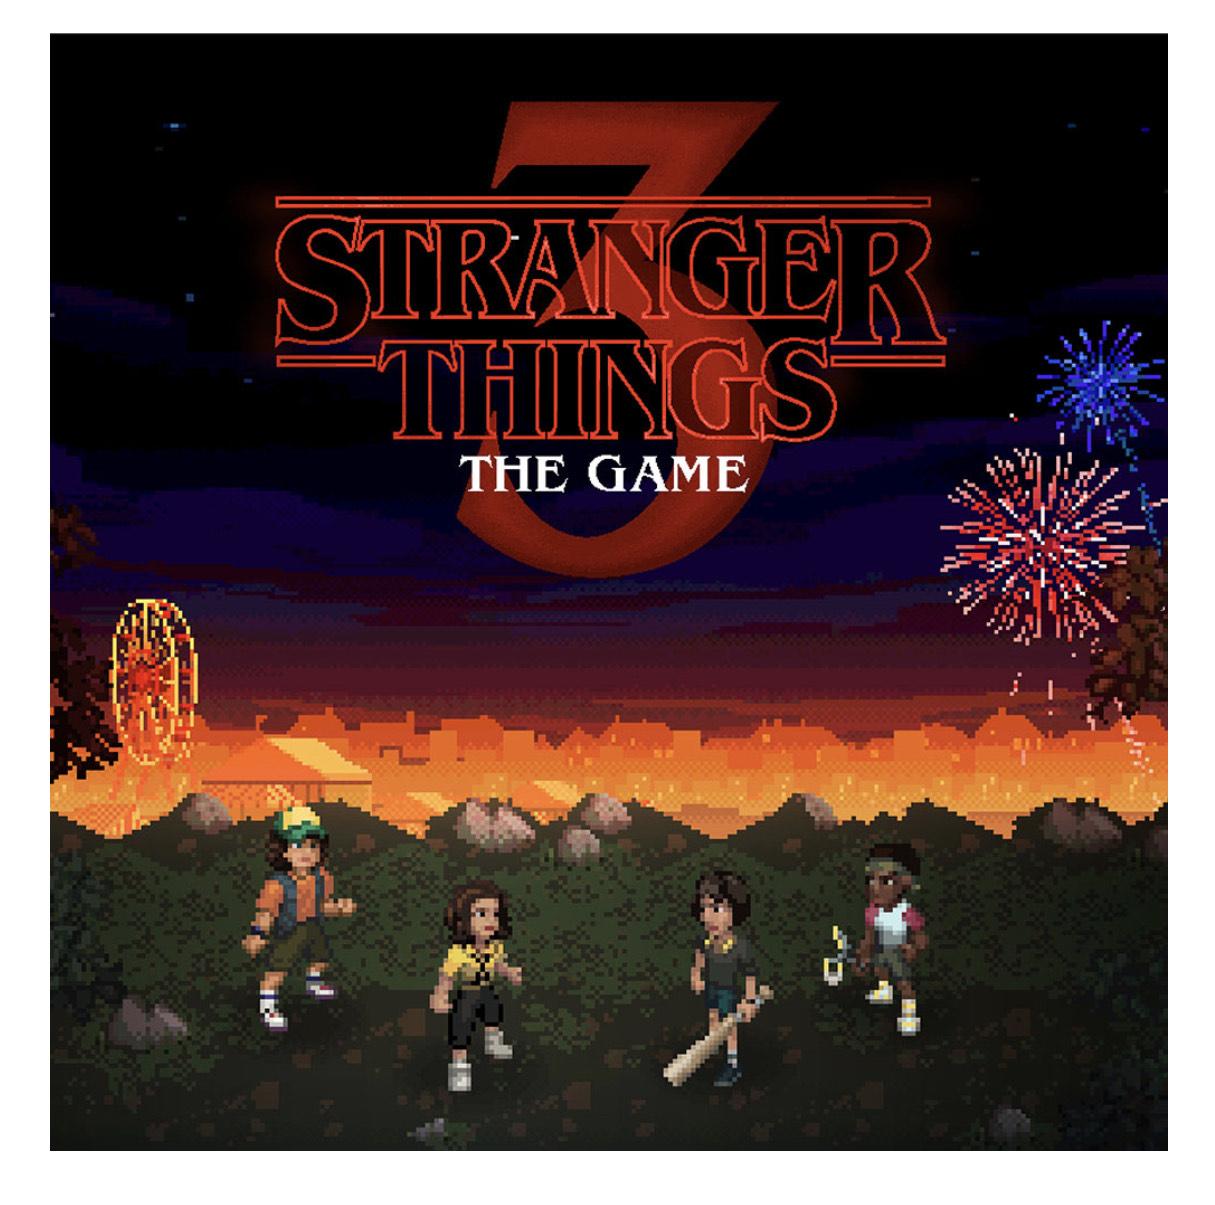 Stranger Things 3 - Nintendo Switch eshop (75% Descuento)